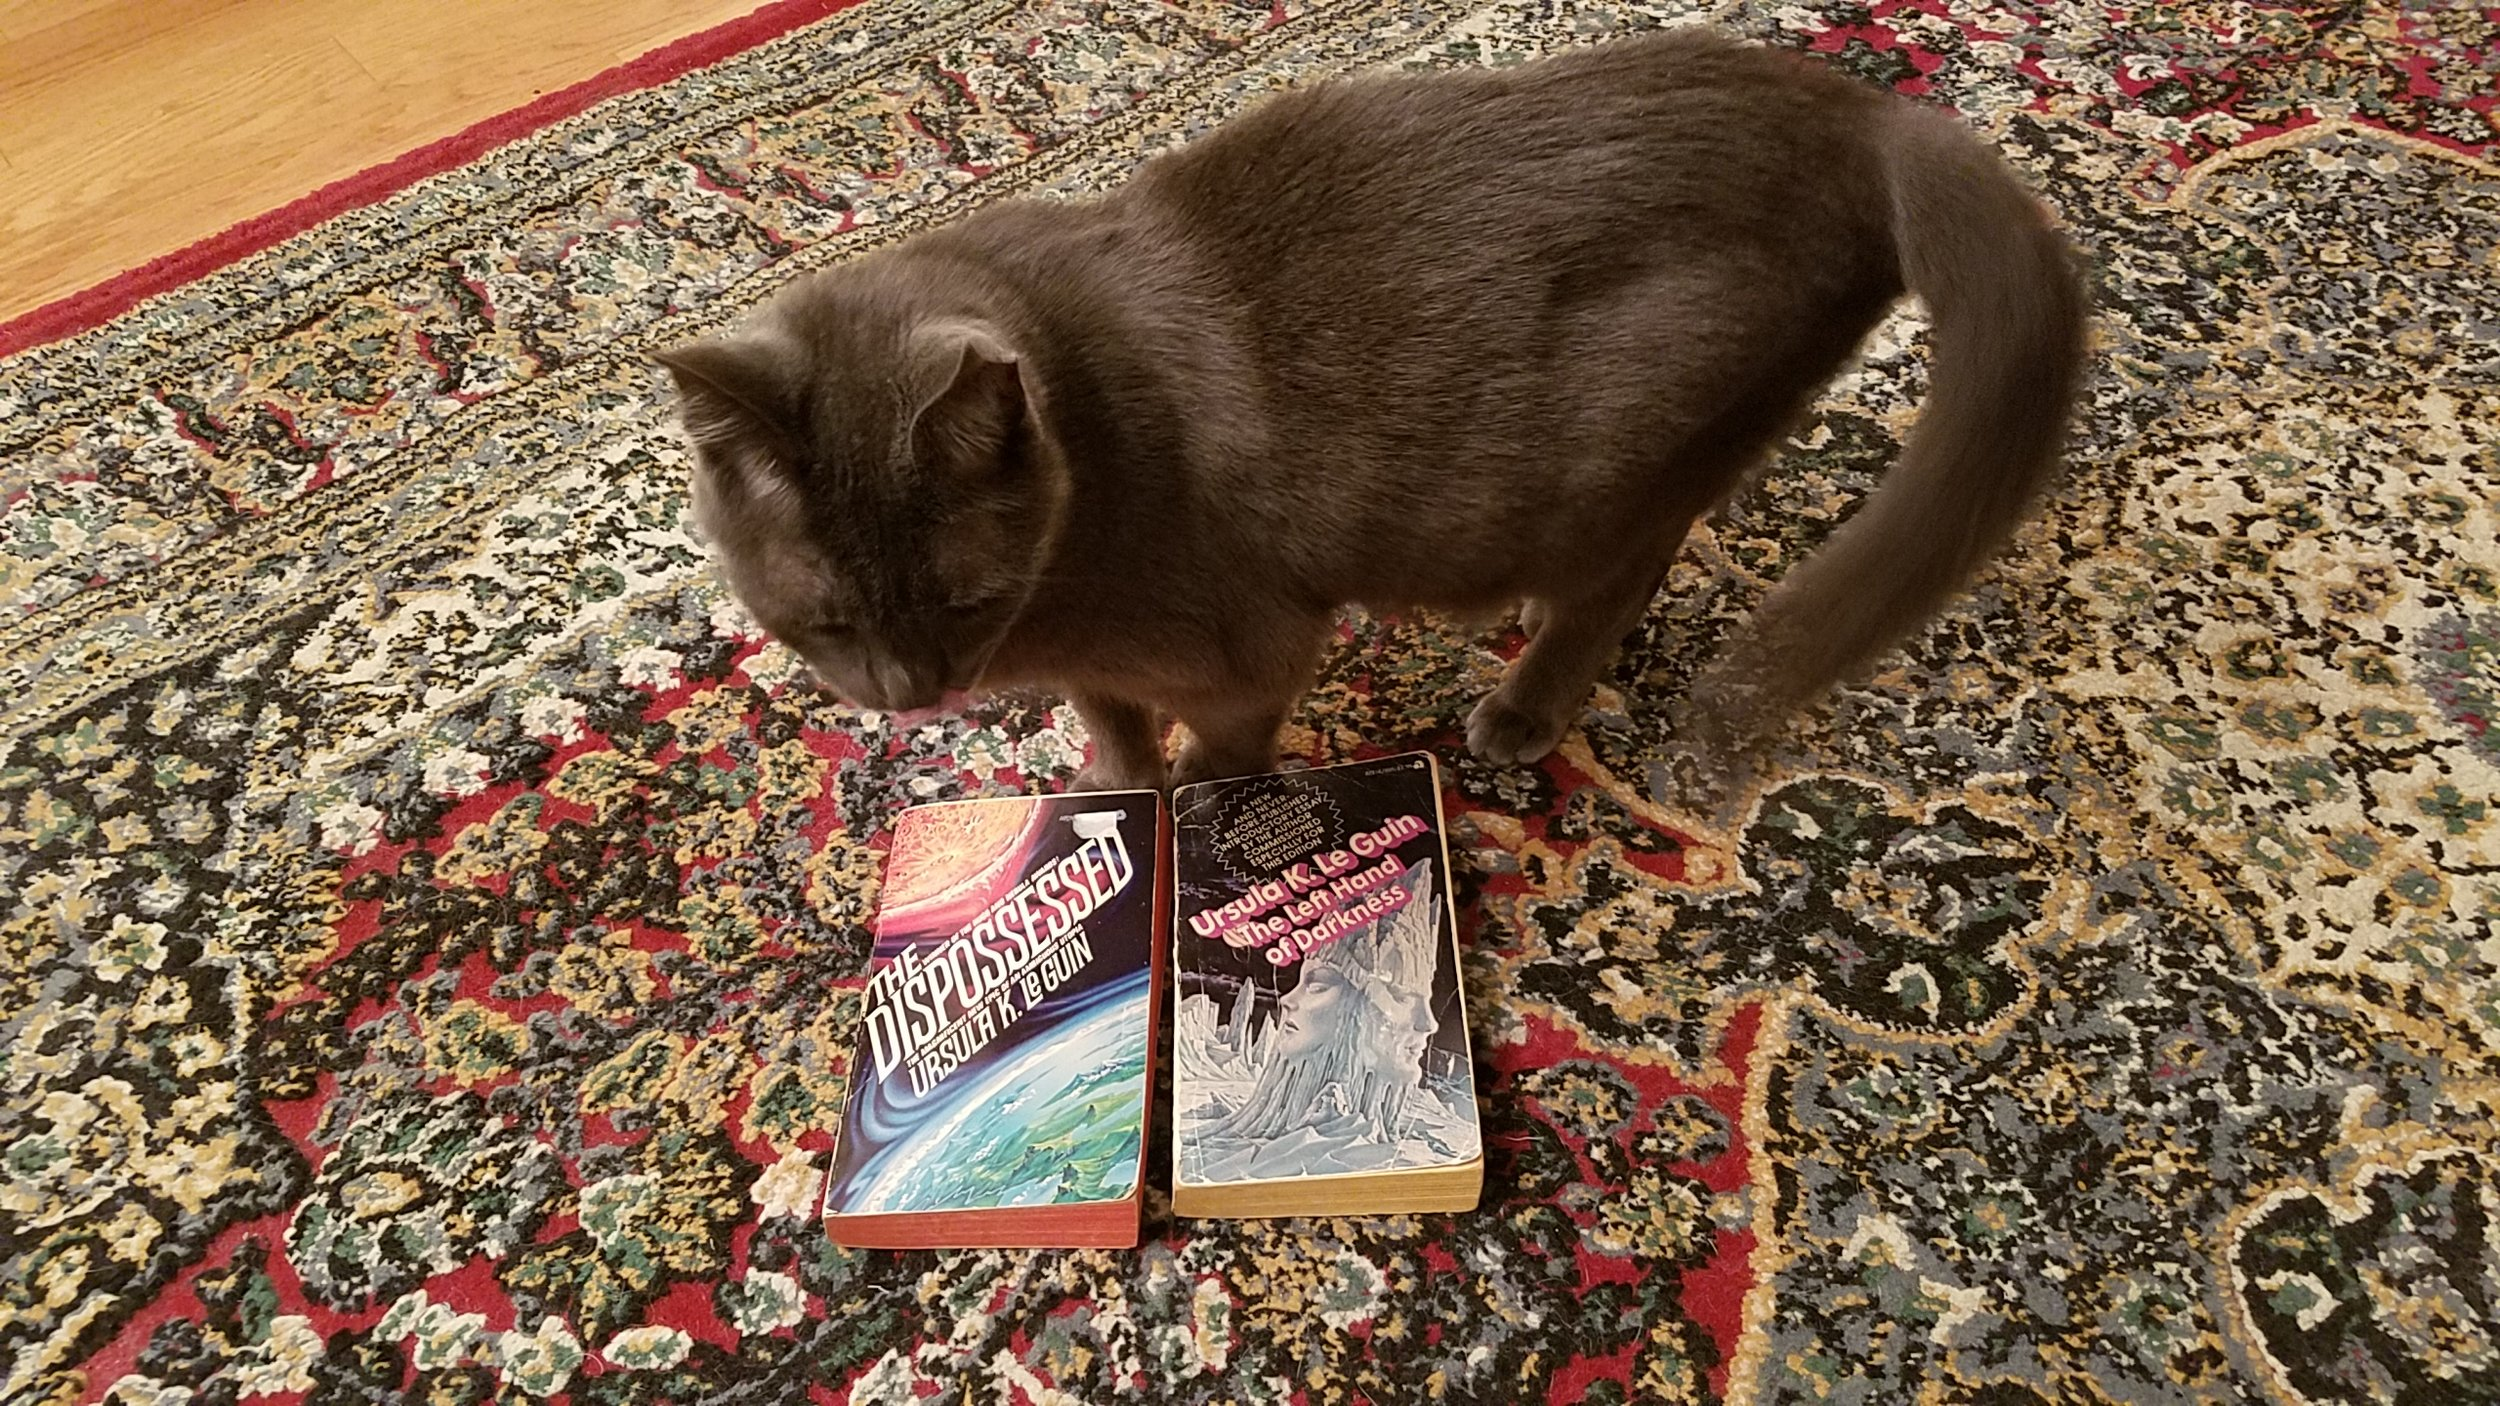 Ursula K. Le Guin's cross-species appeal.